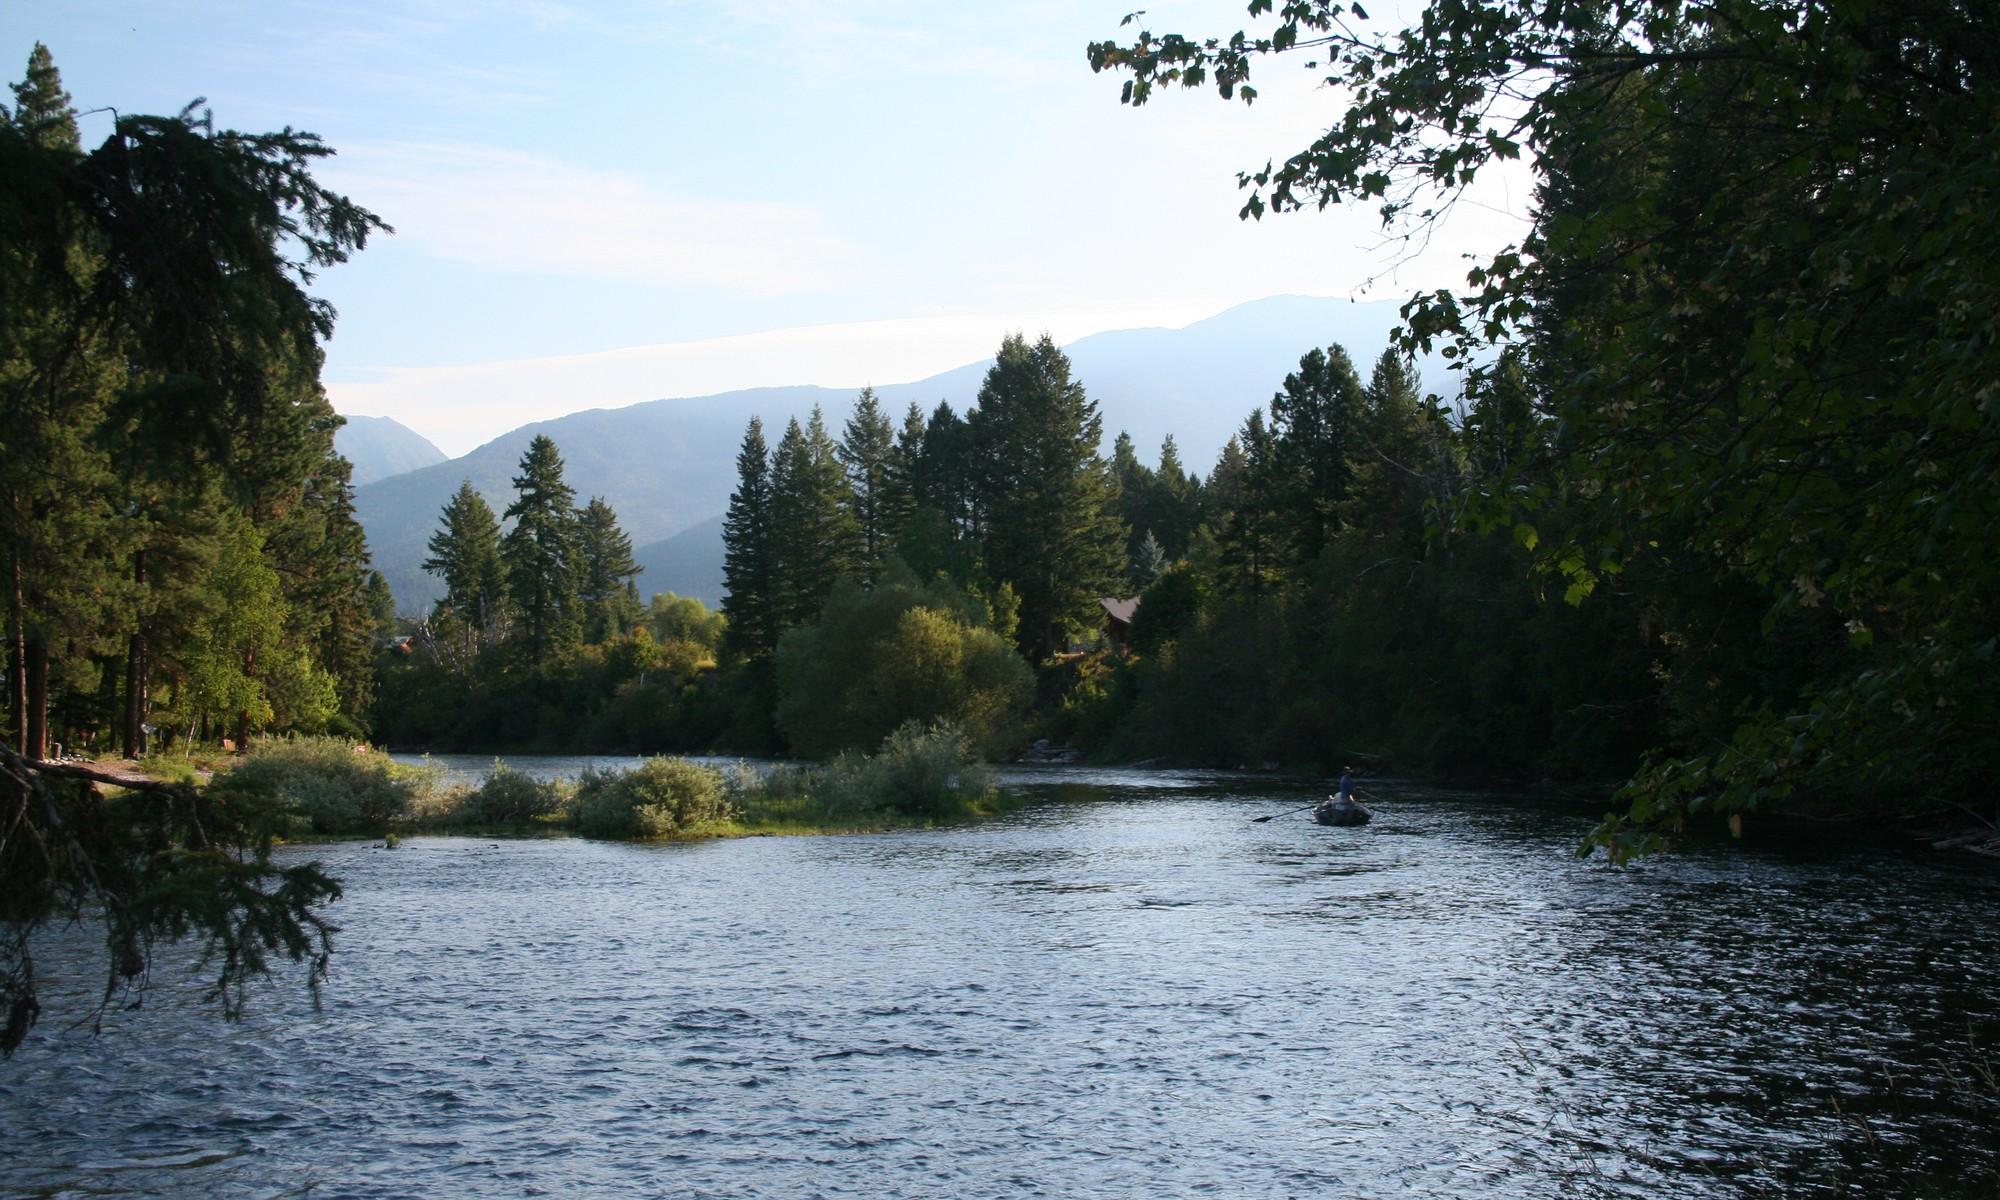 Land for Sale at Swan River Frontage 120 Cygent Way Bigfork, Montana 59911 United States